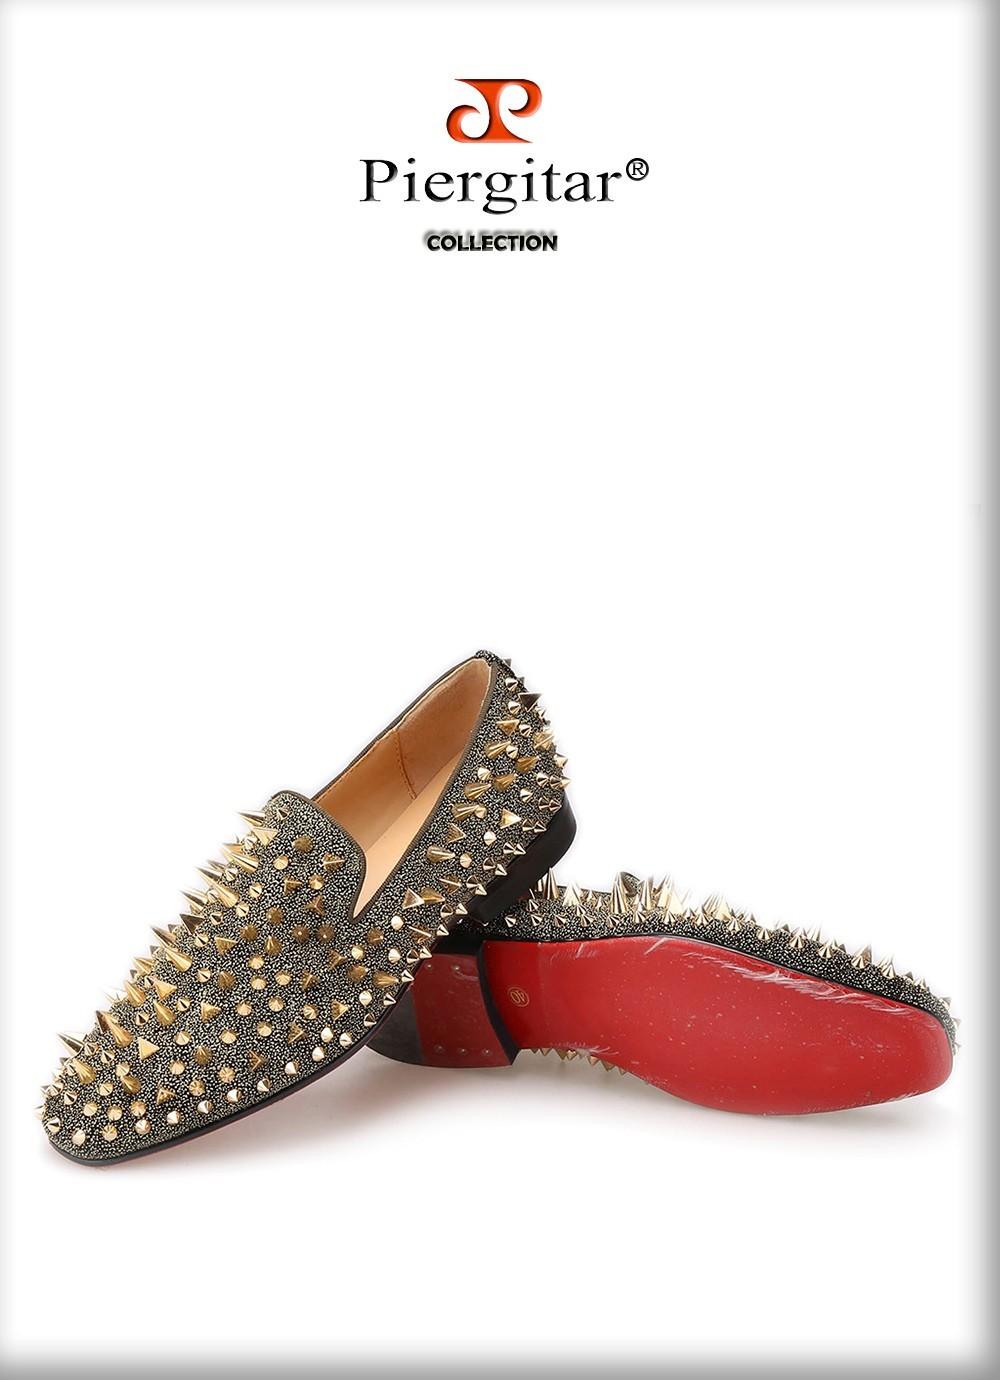 Piergitar gold spiked shoe 4